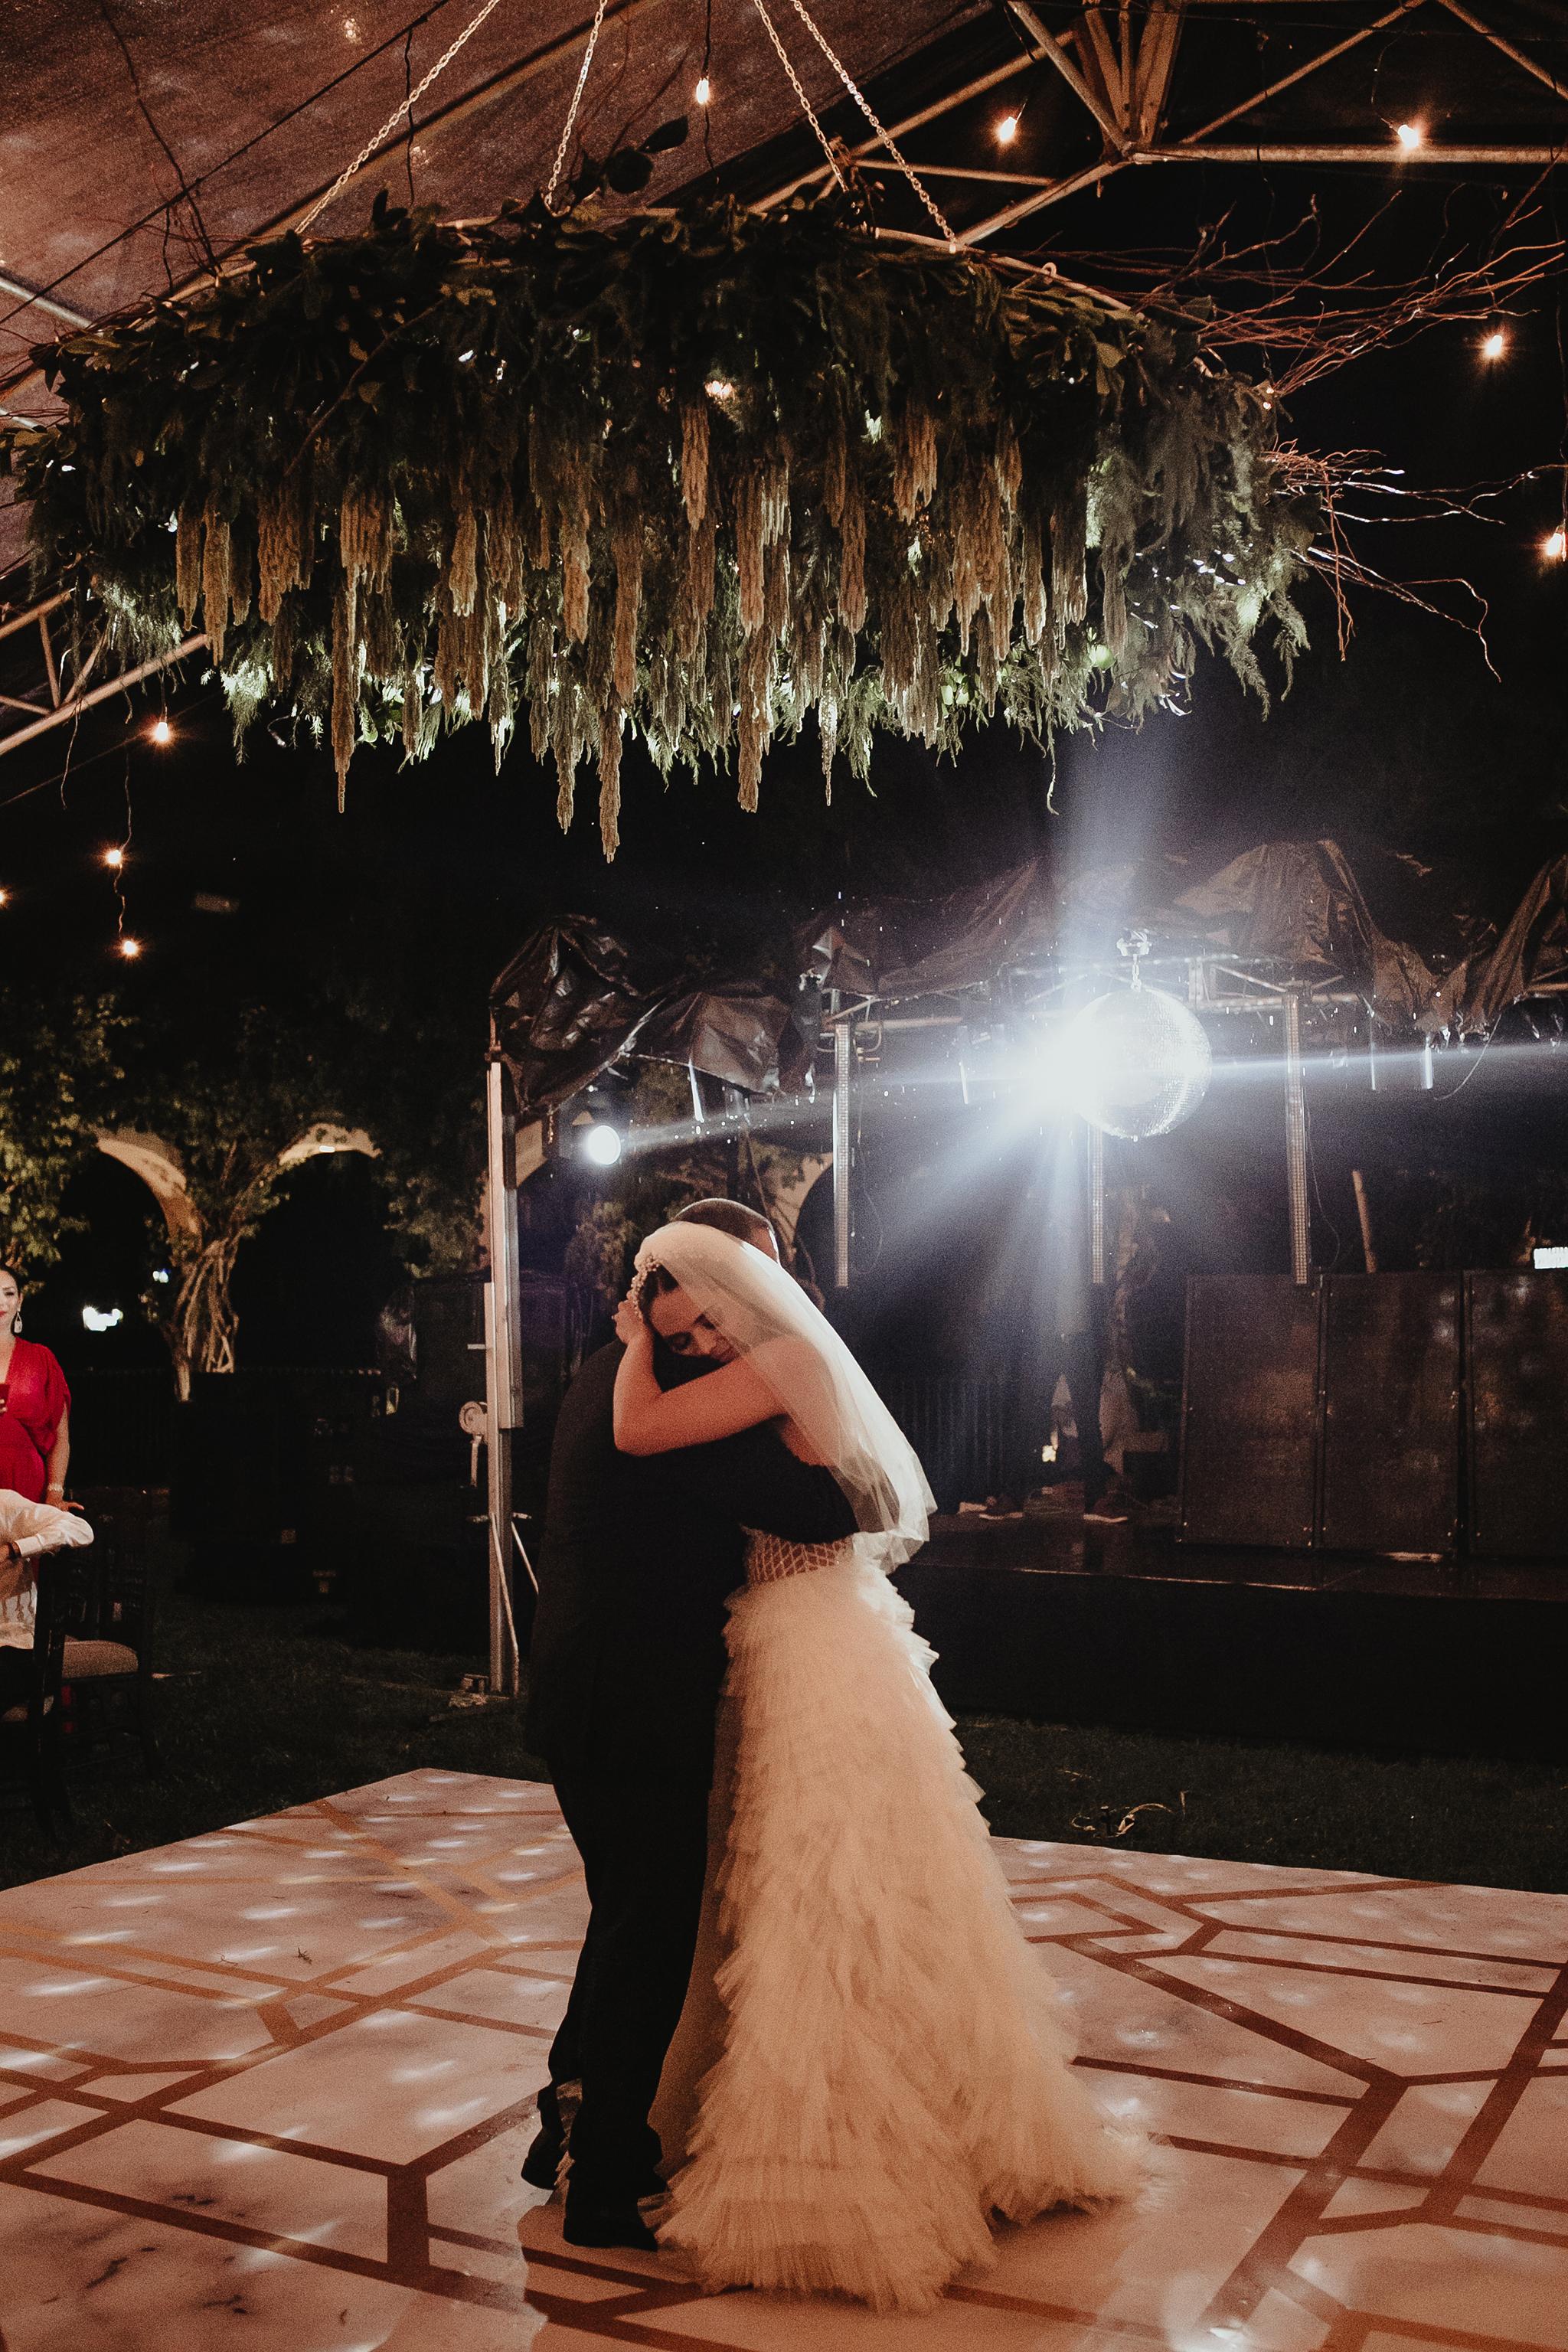 1056R&F__WeddingDestination_Weddingmerida_BodaMexico_FotografoDeBodas_FabrizioSimoneenFotografo.jpg